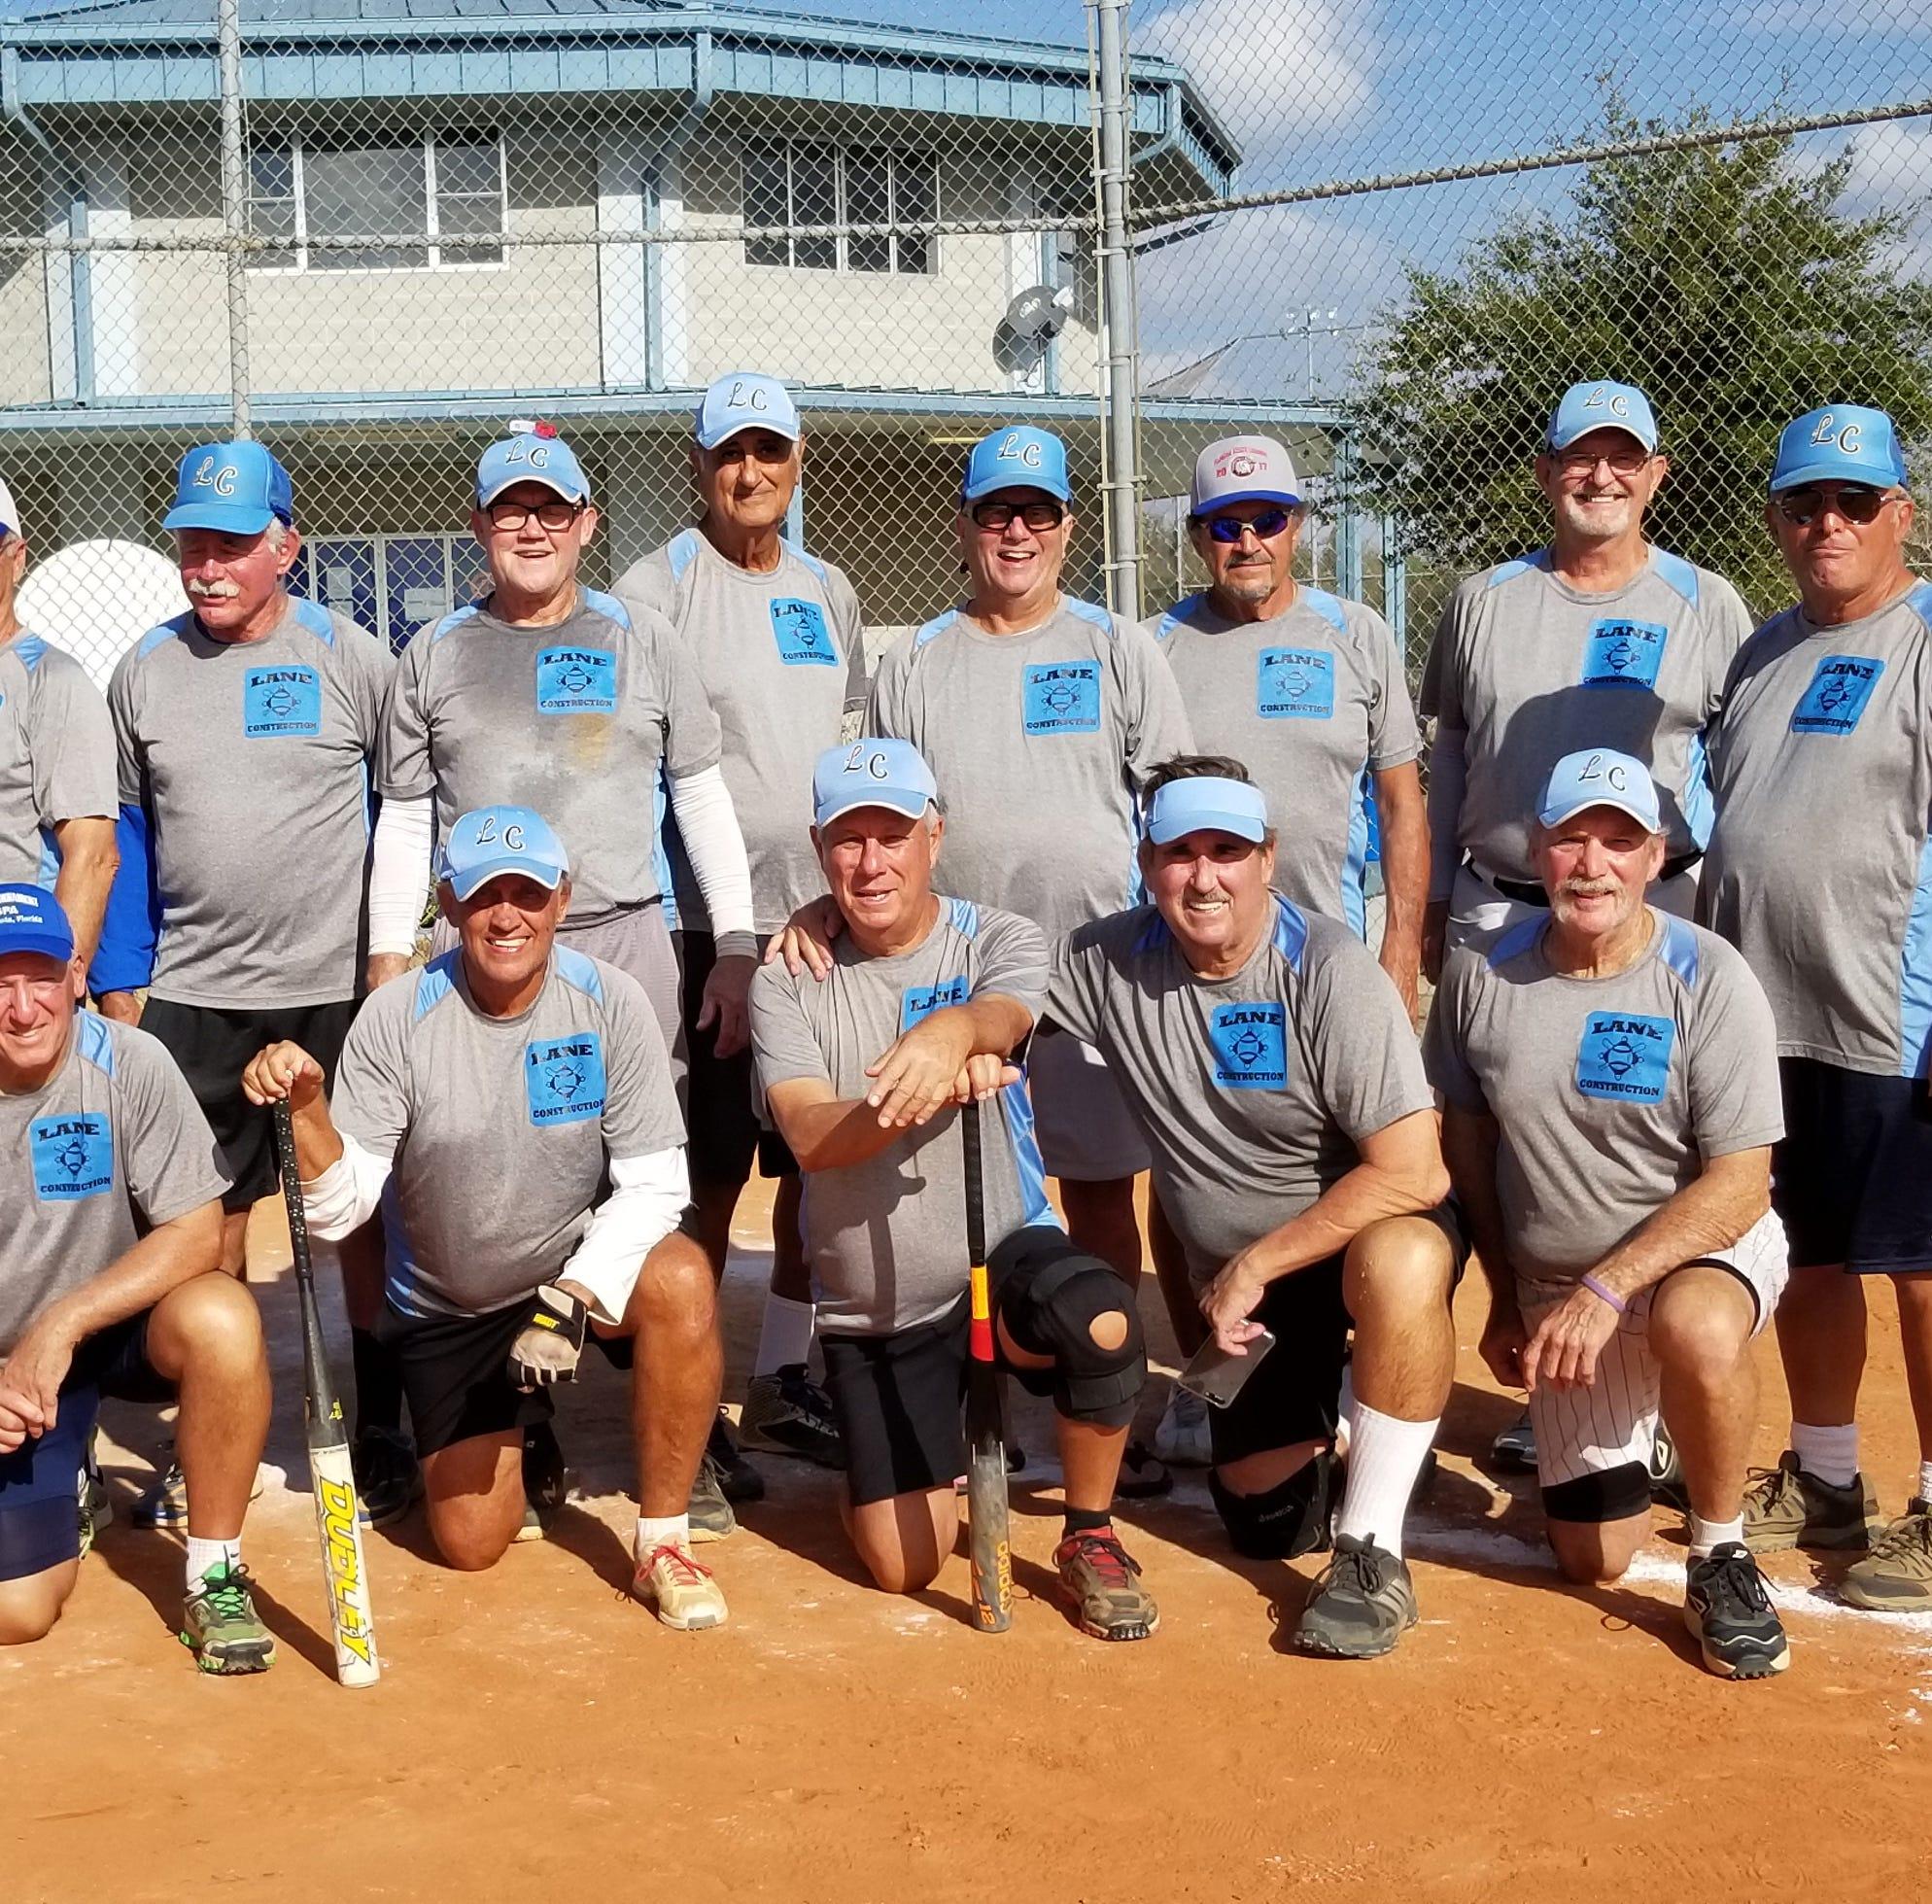 Lane Construction wins 3rd straight state softball title